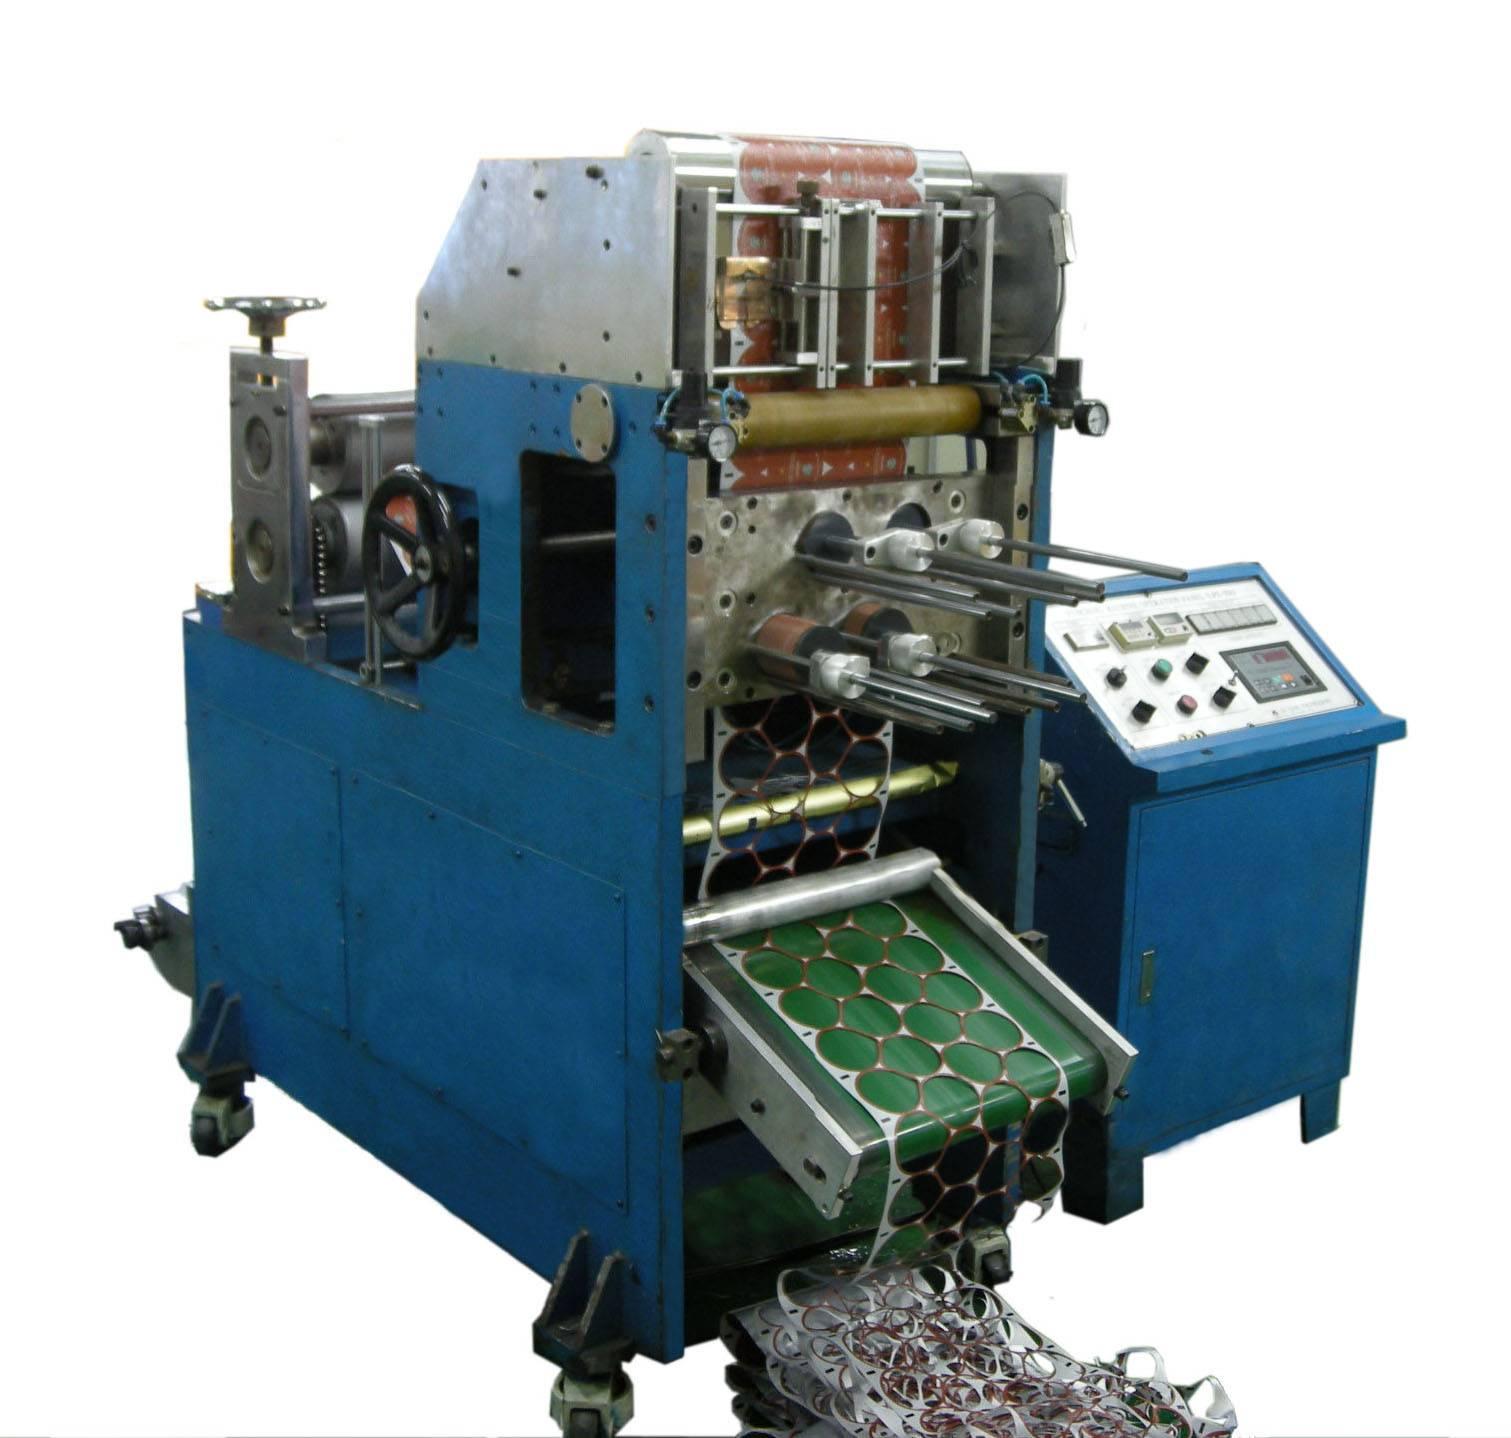 AL Lid & IML punching(Die cut) machine